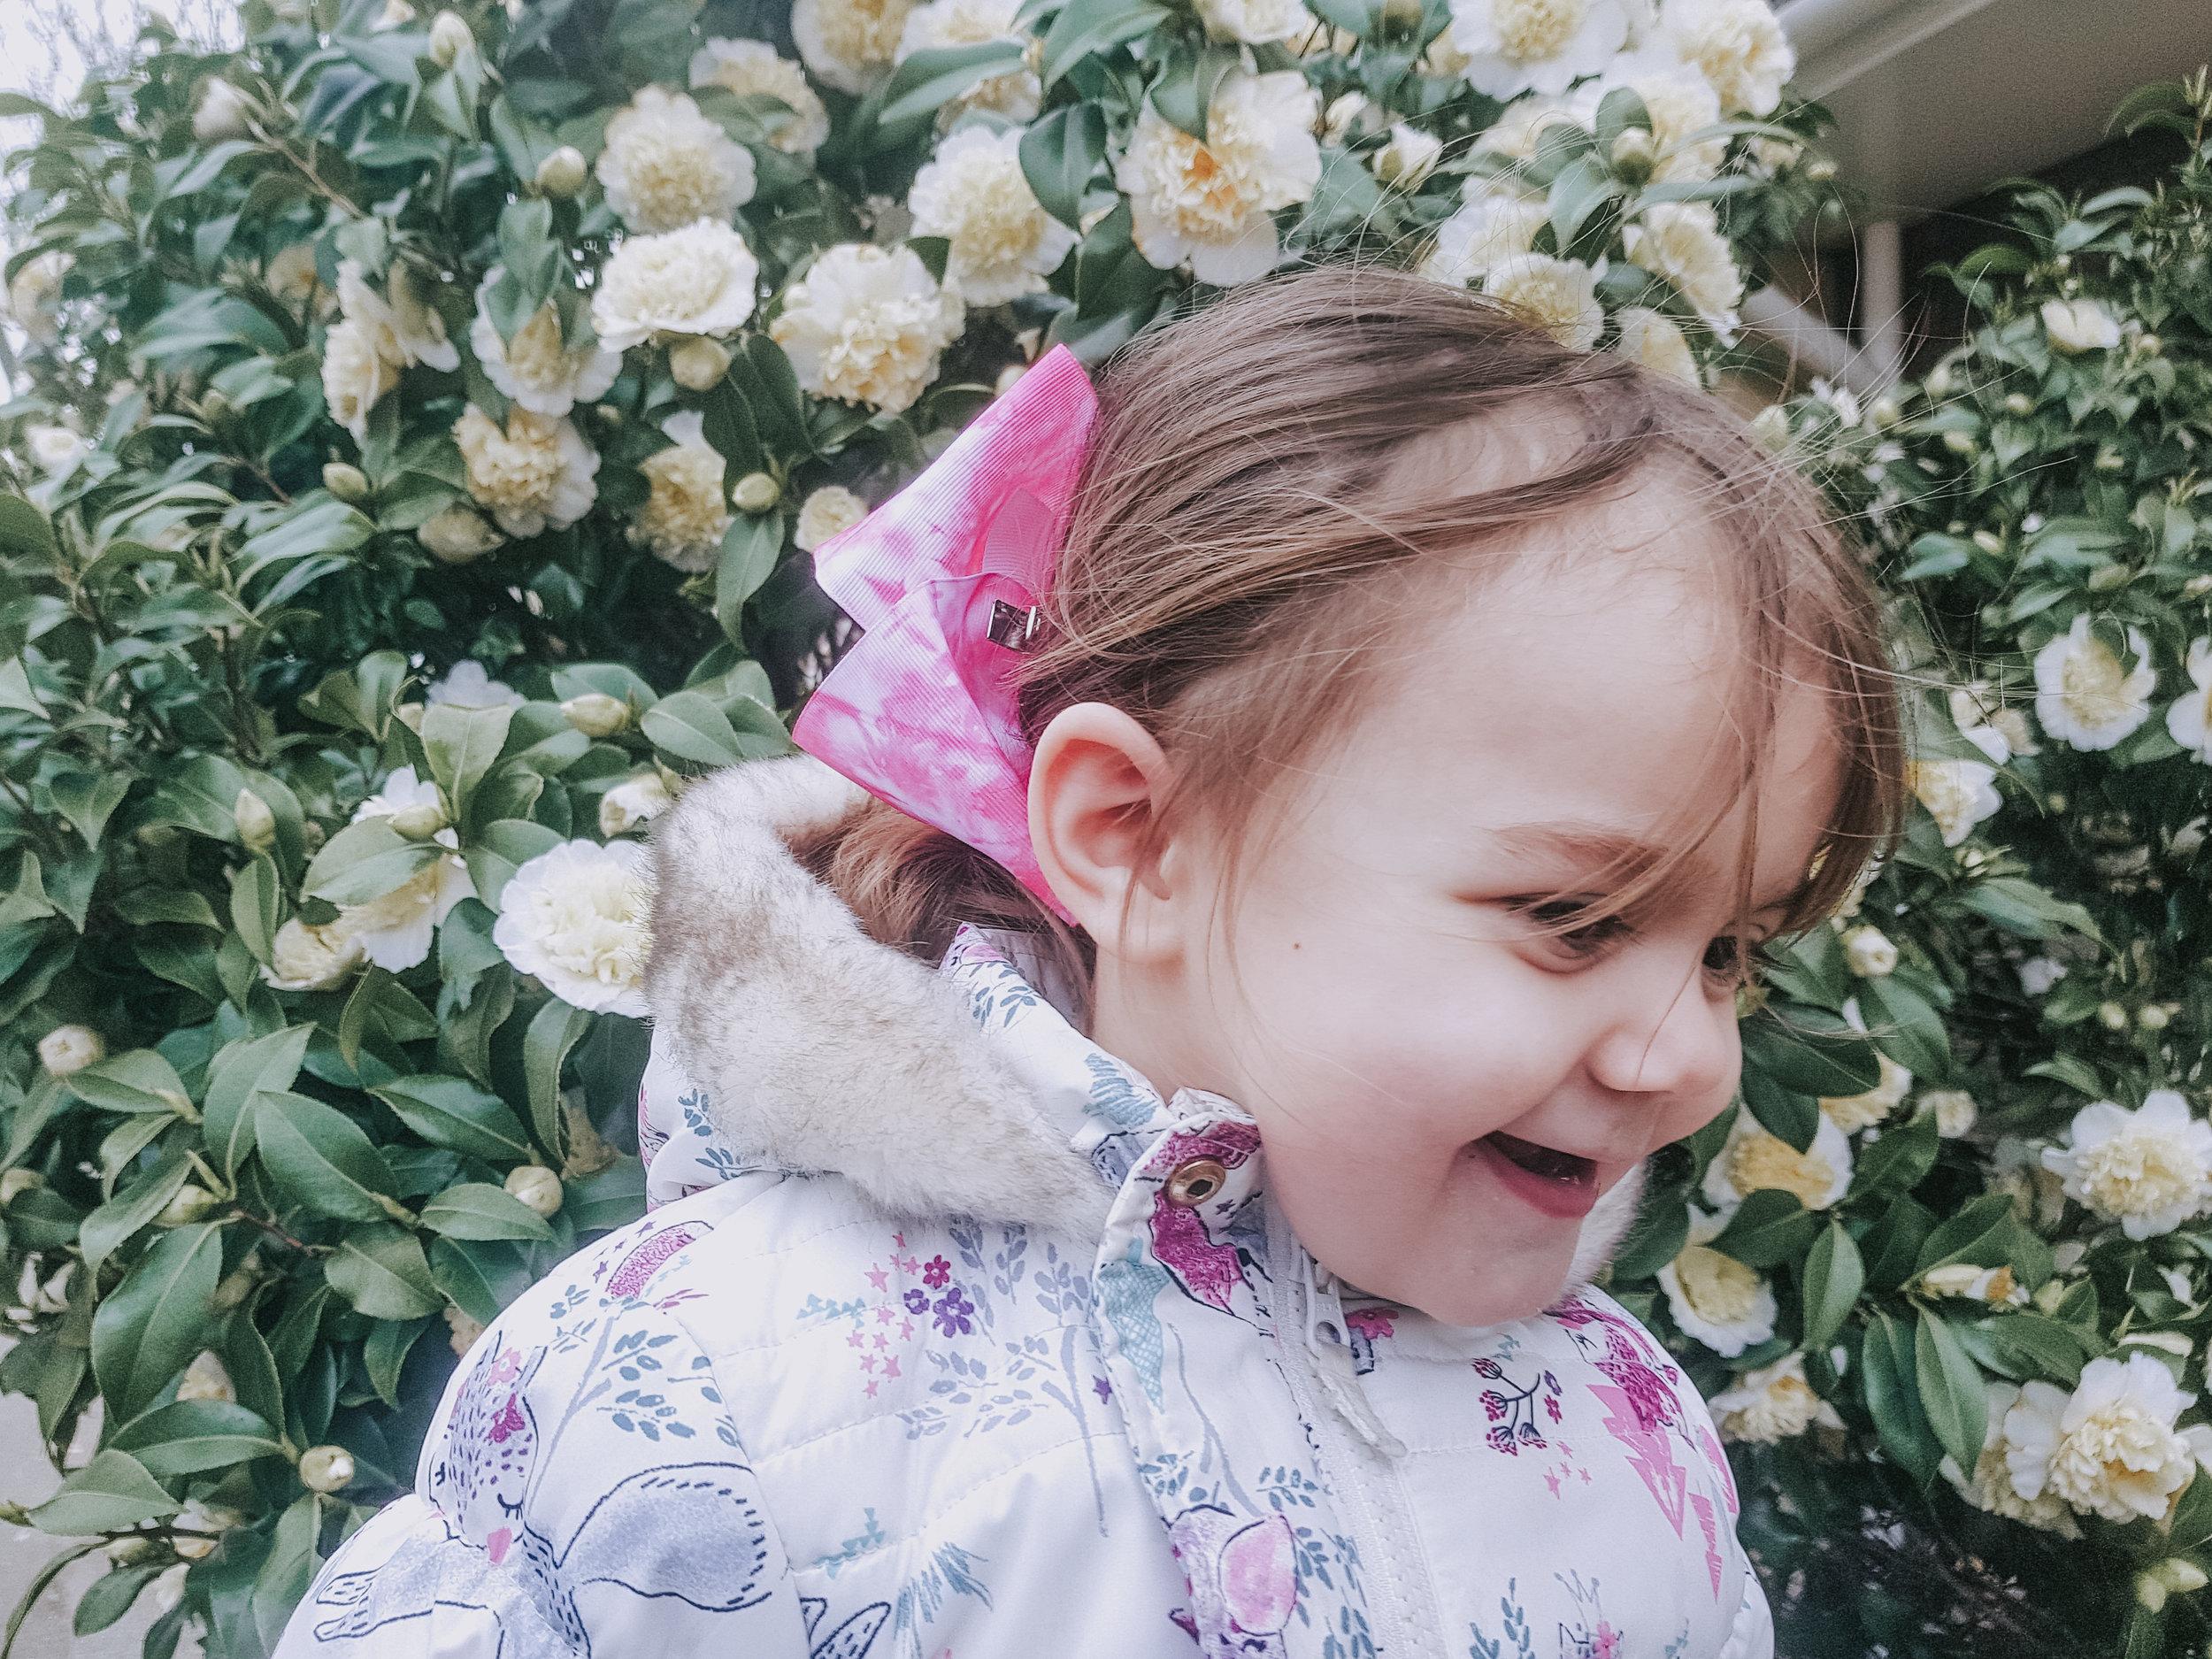 Spring blossom and smiles